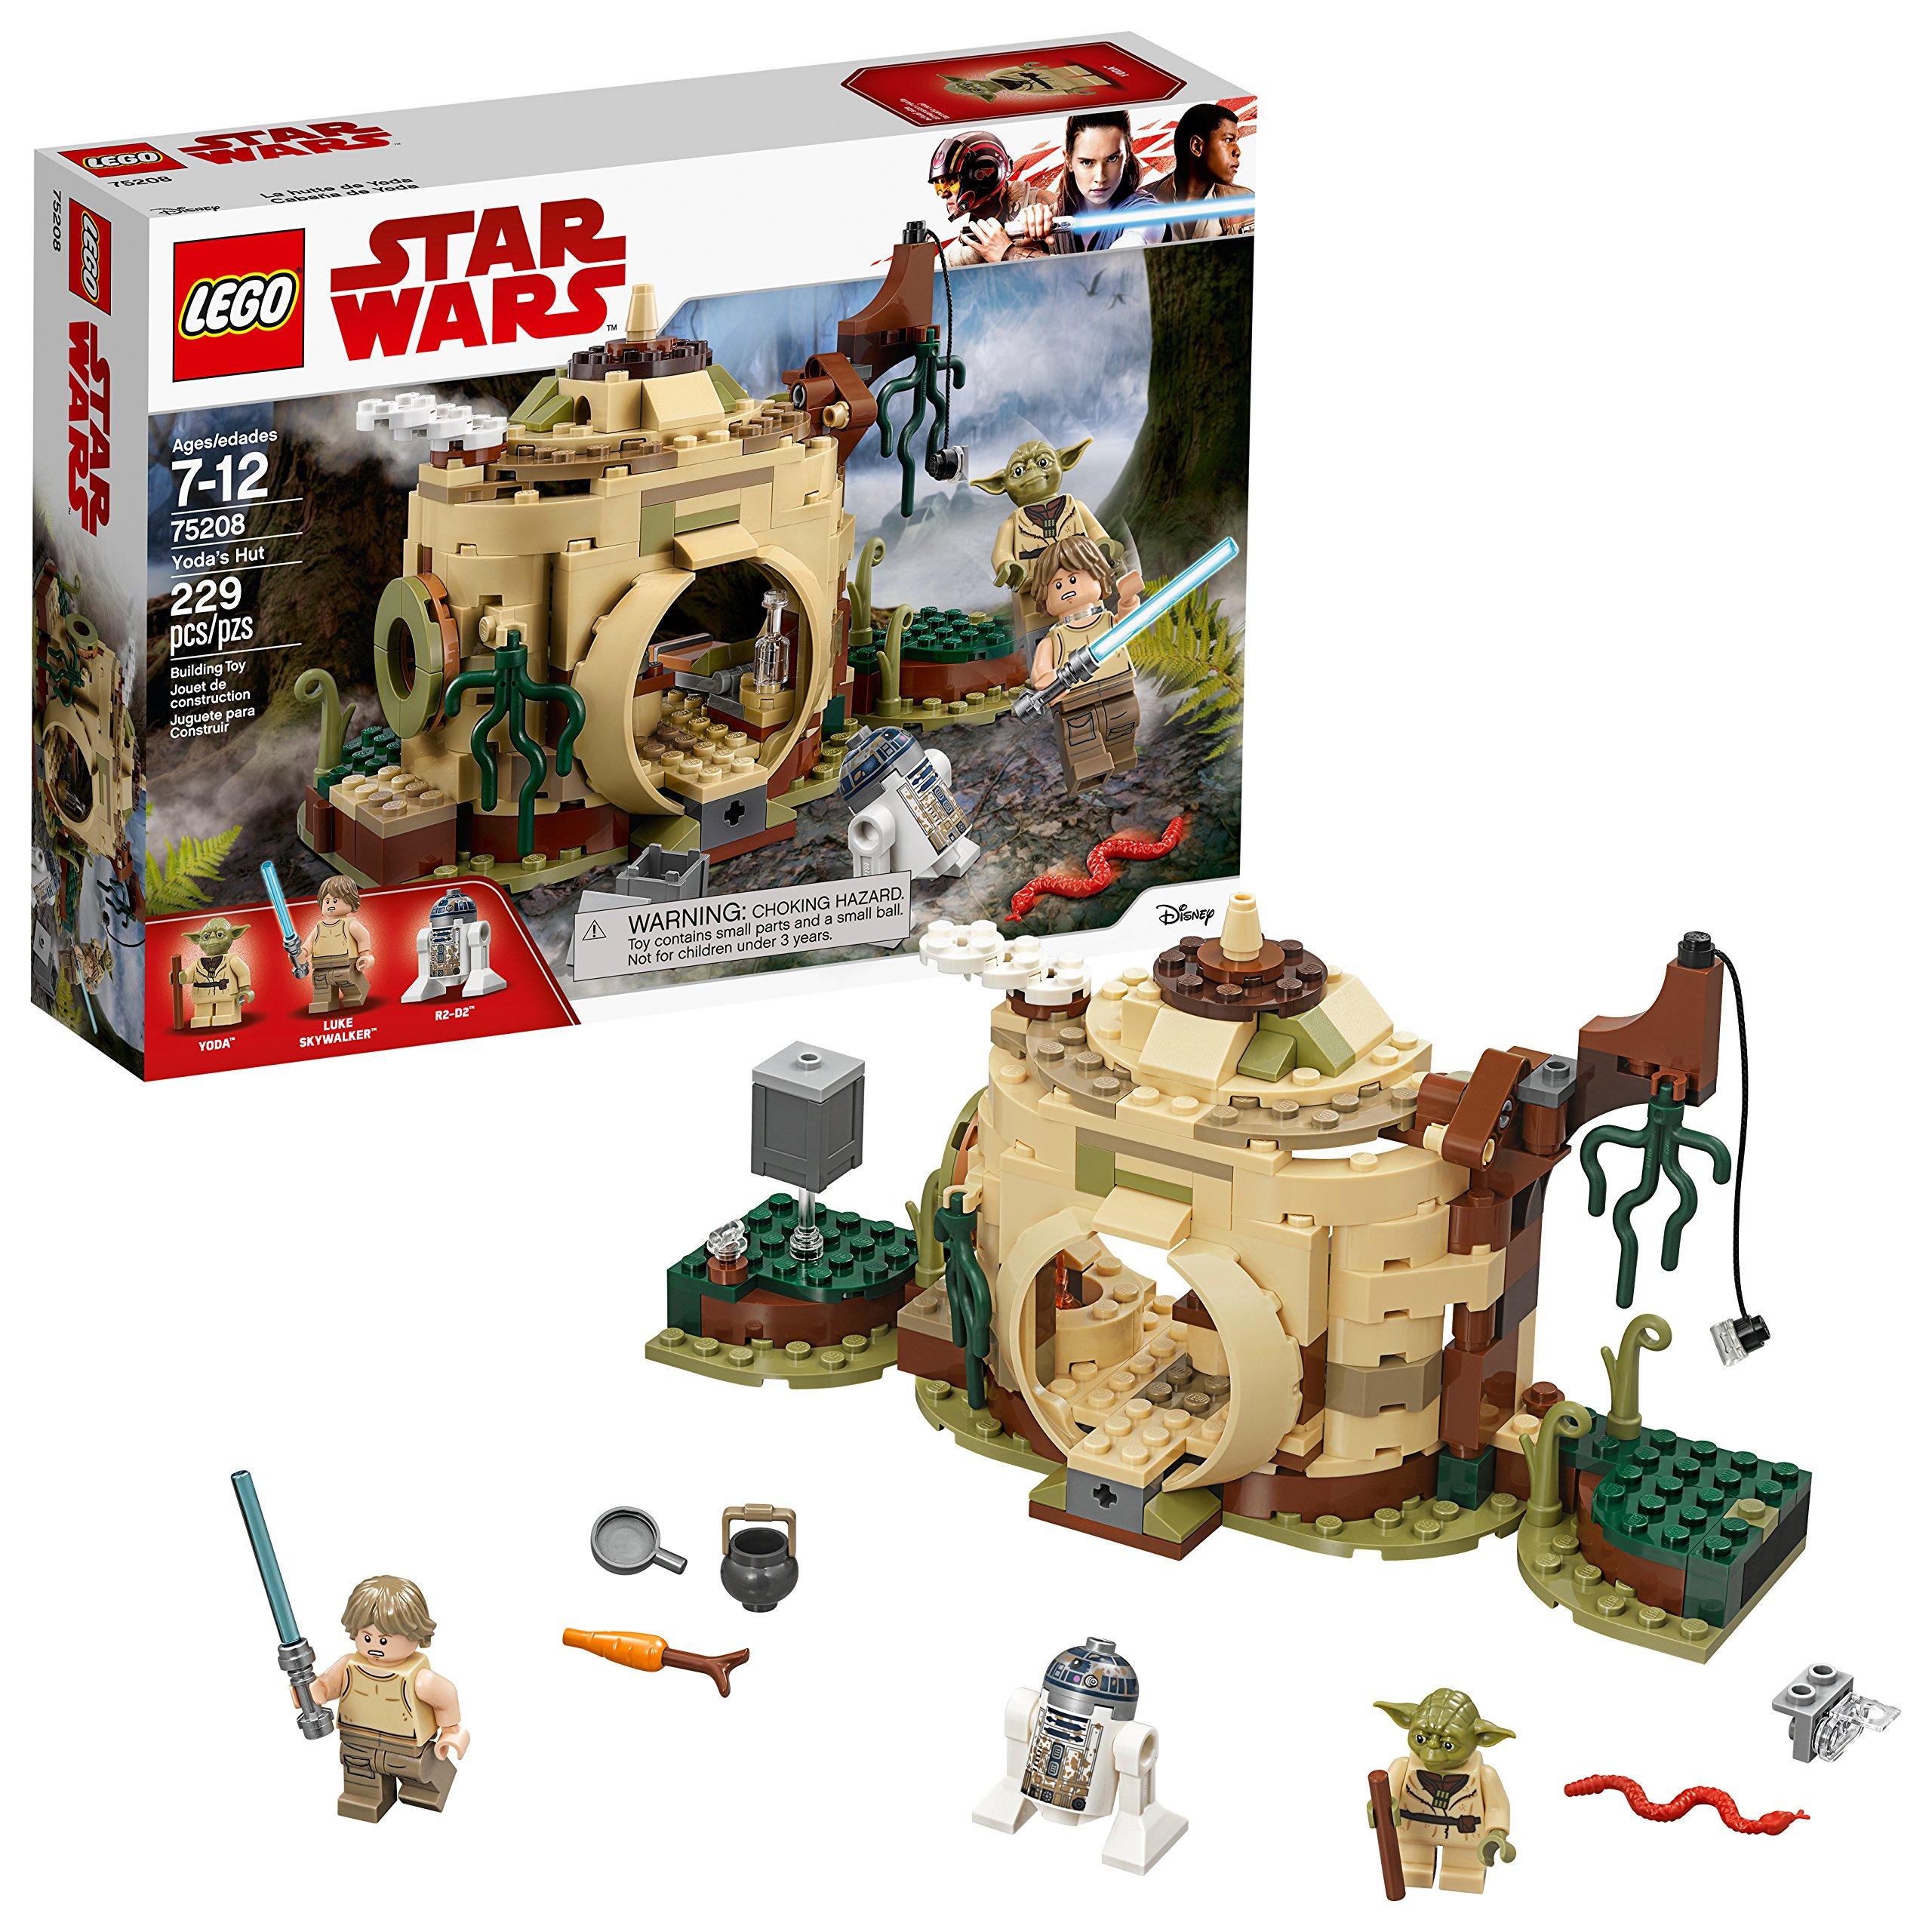 LEGO Star Wars: The Empire Strikes Back Yoda's Hut 75208 Building Kit (229 Piece)